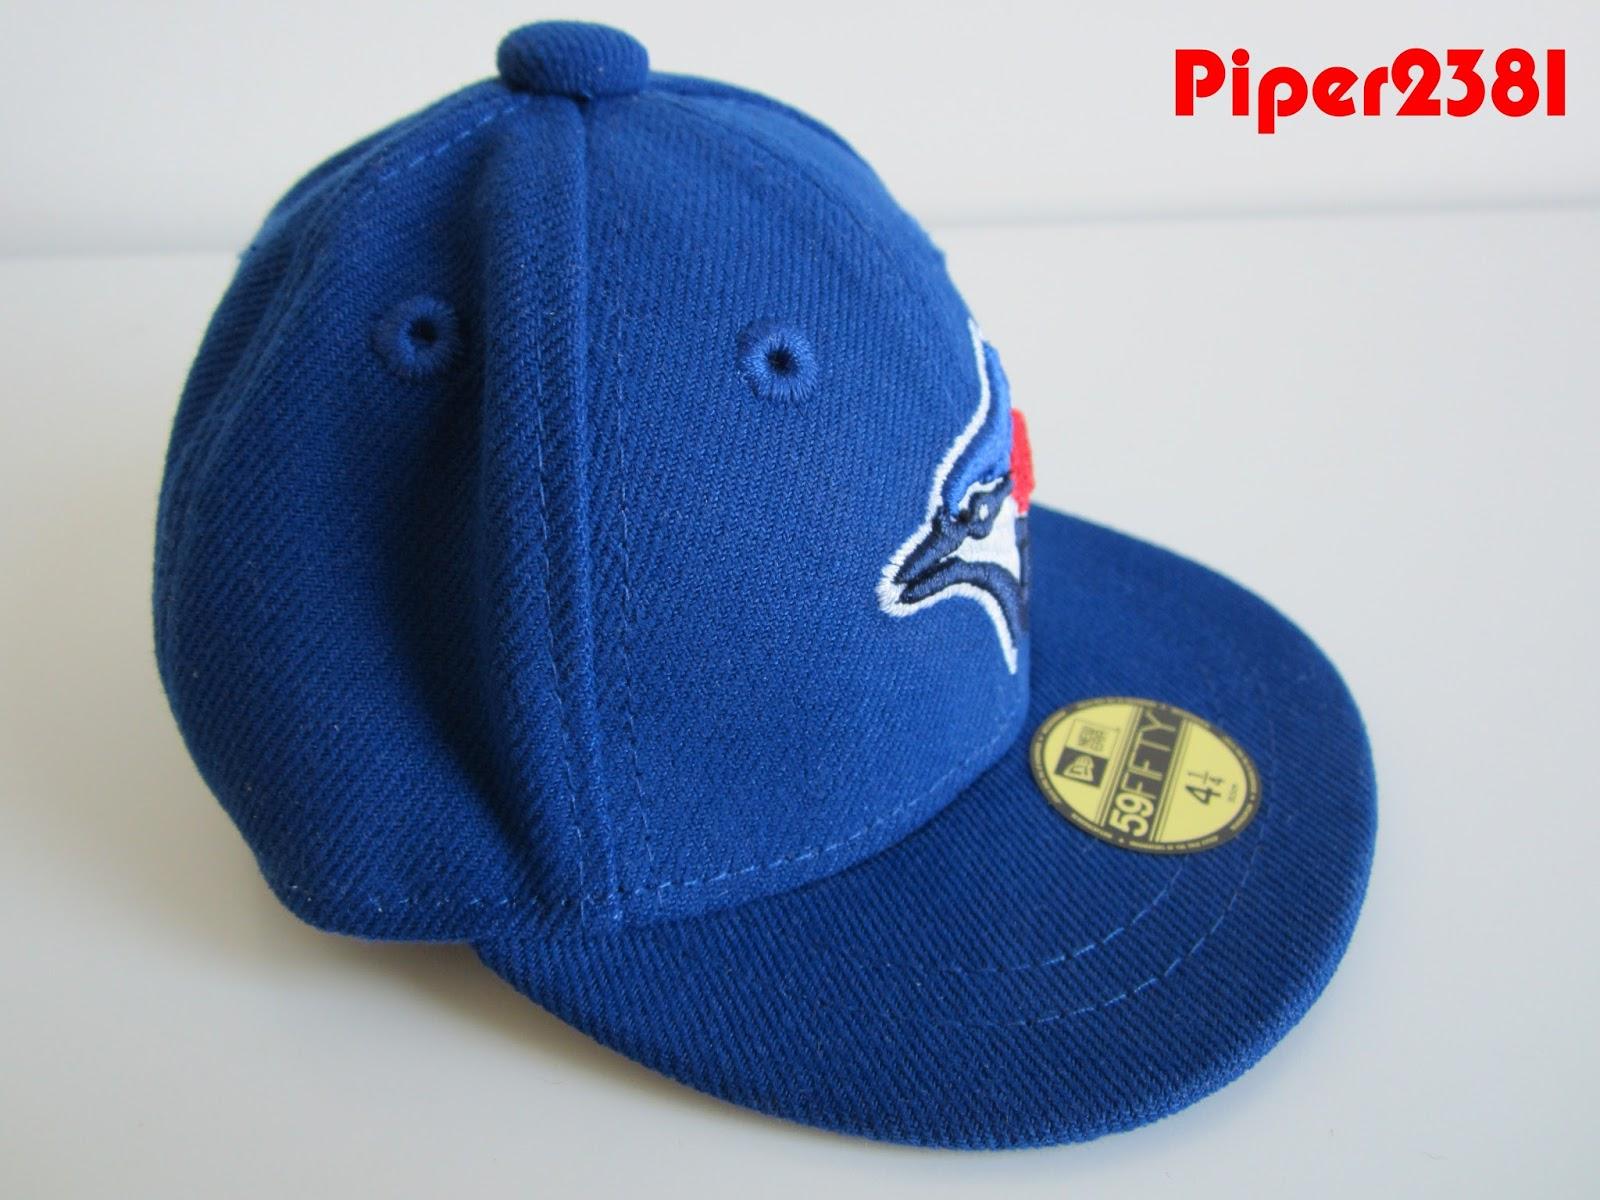 dcd6631308c New Era Blue Jays Mini Cap